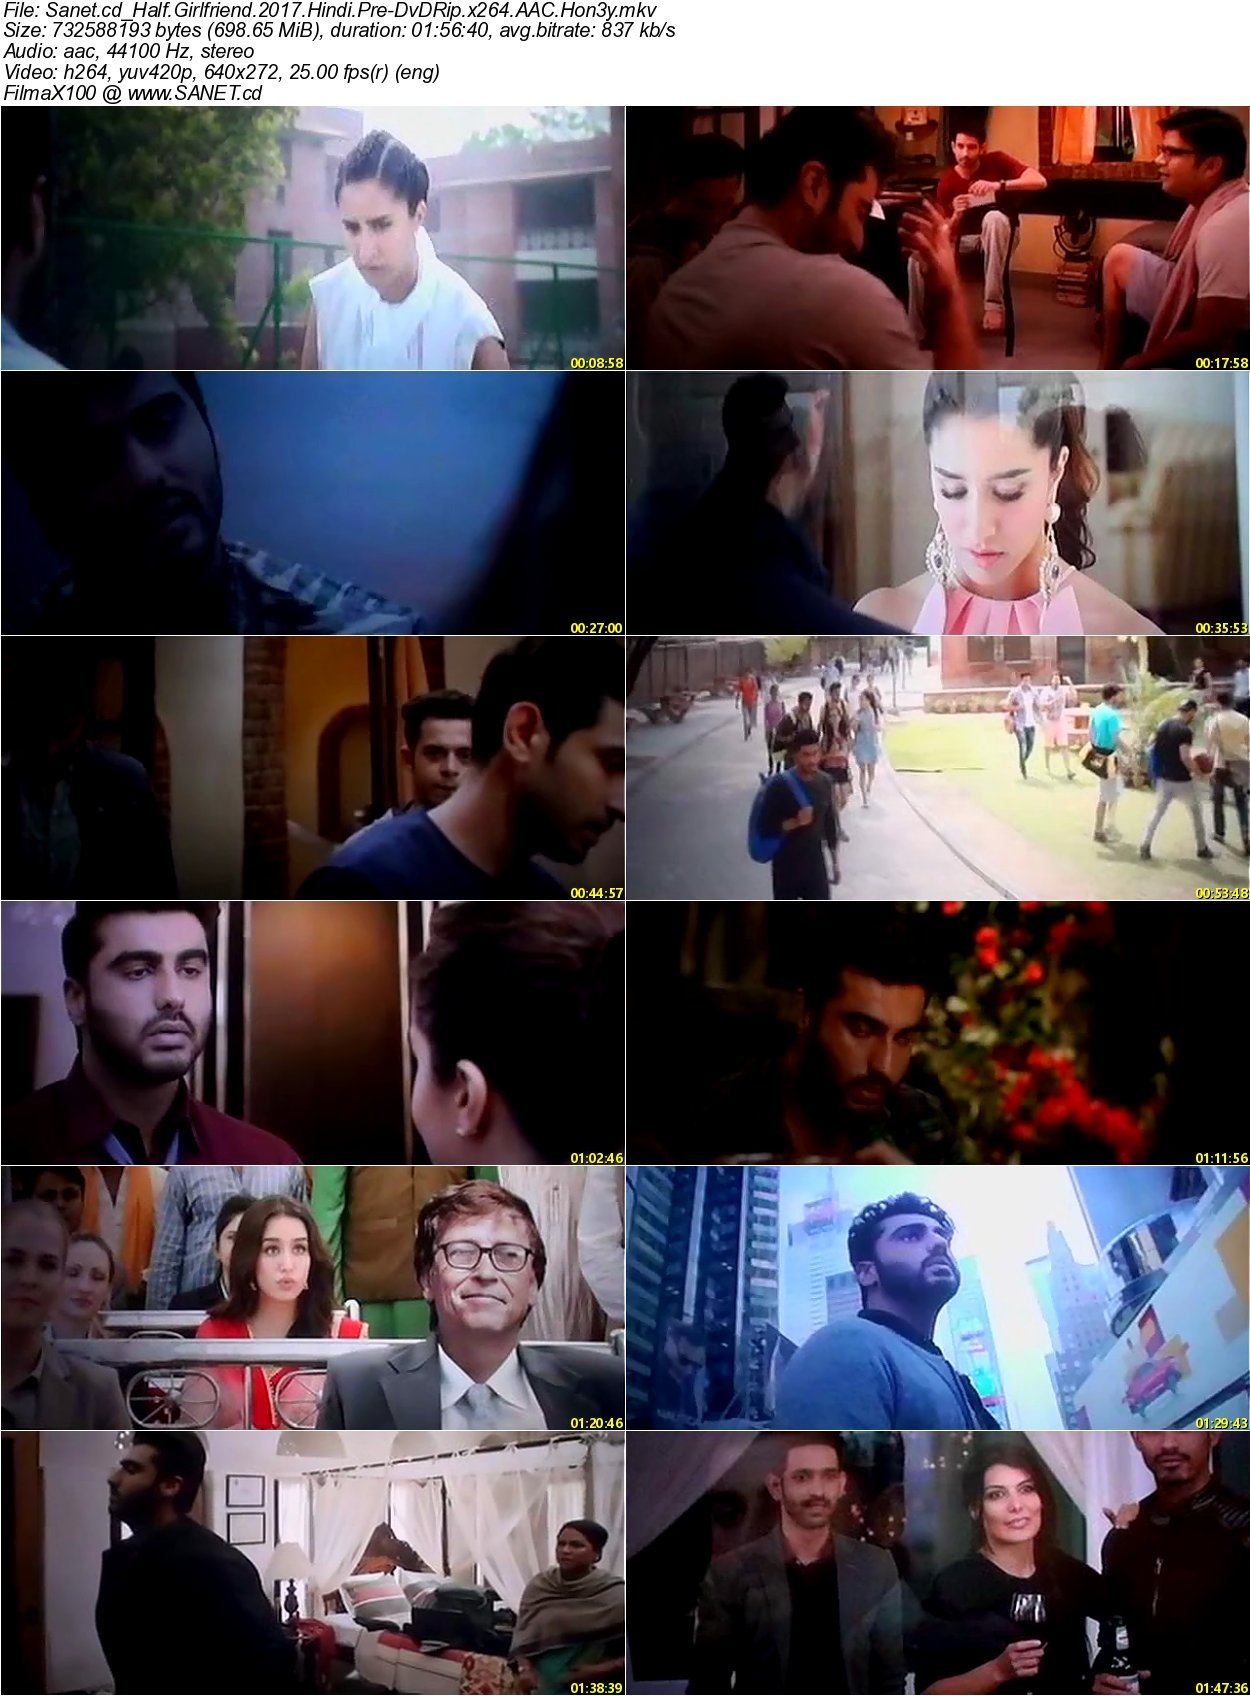 Half Girlfriend Story Pdf Free Download In Hindi Peatix